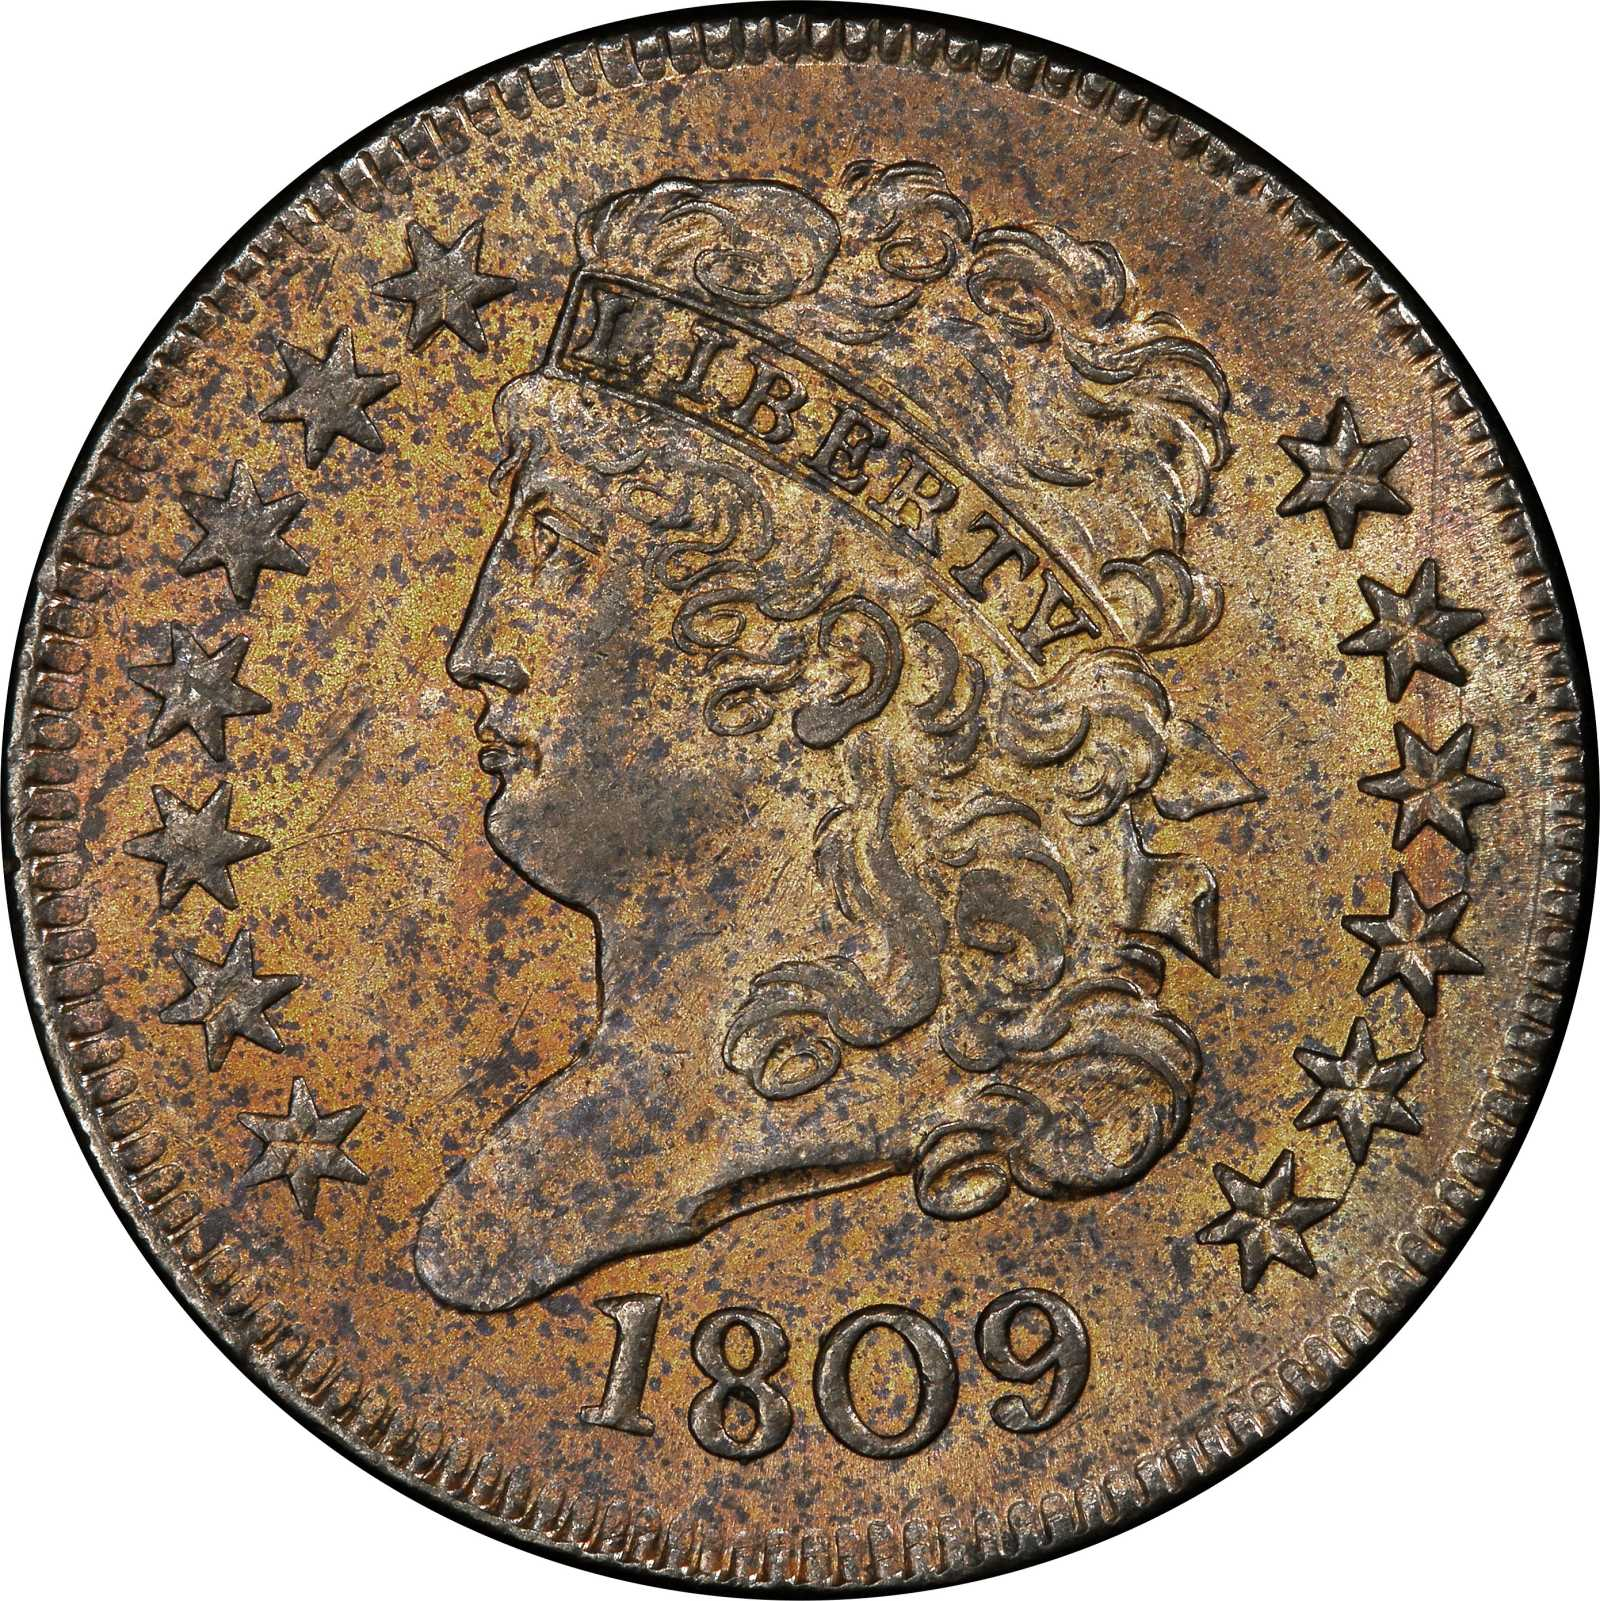 1809 Classic Head Half Cent  Cohen-2, Breen-3  Rarity-3